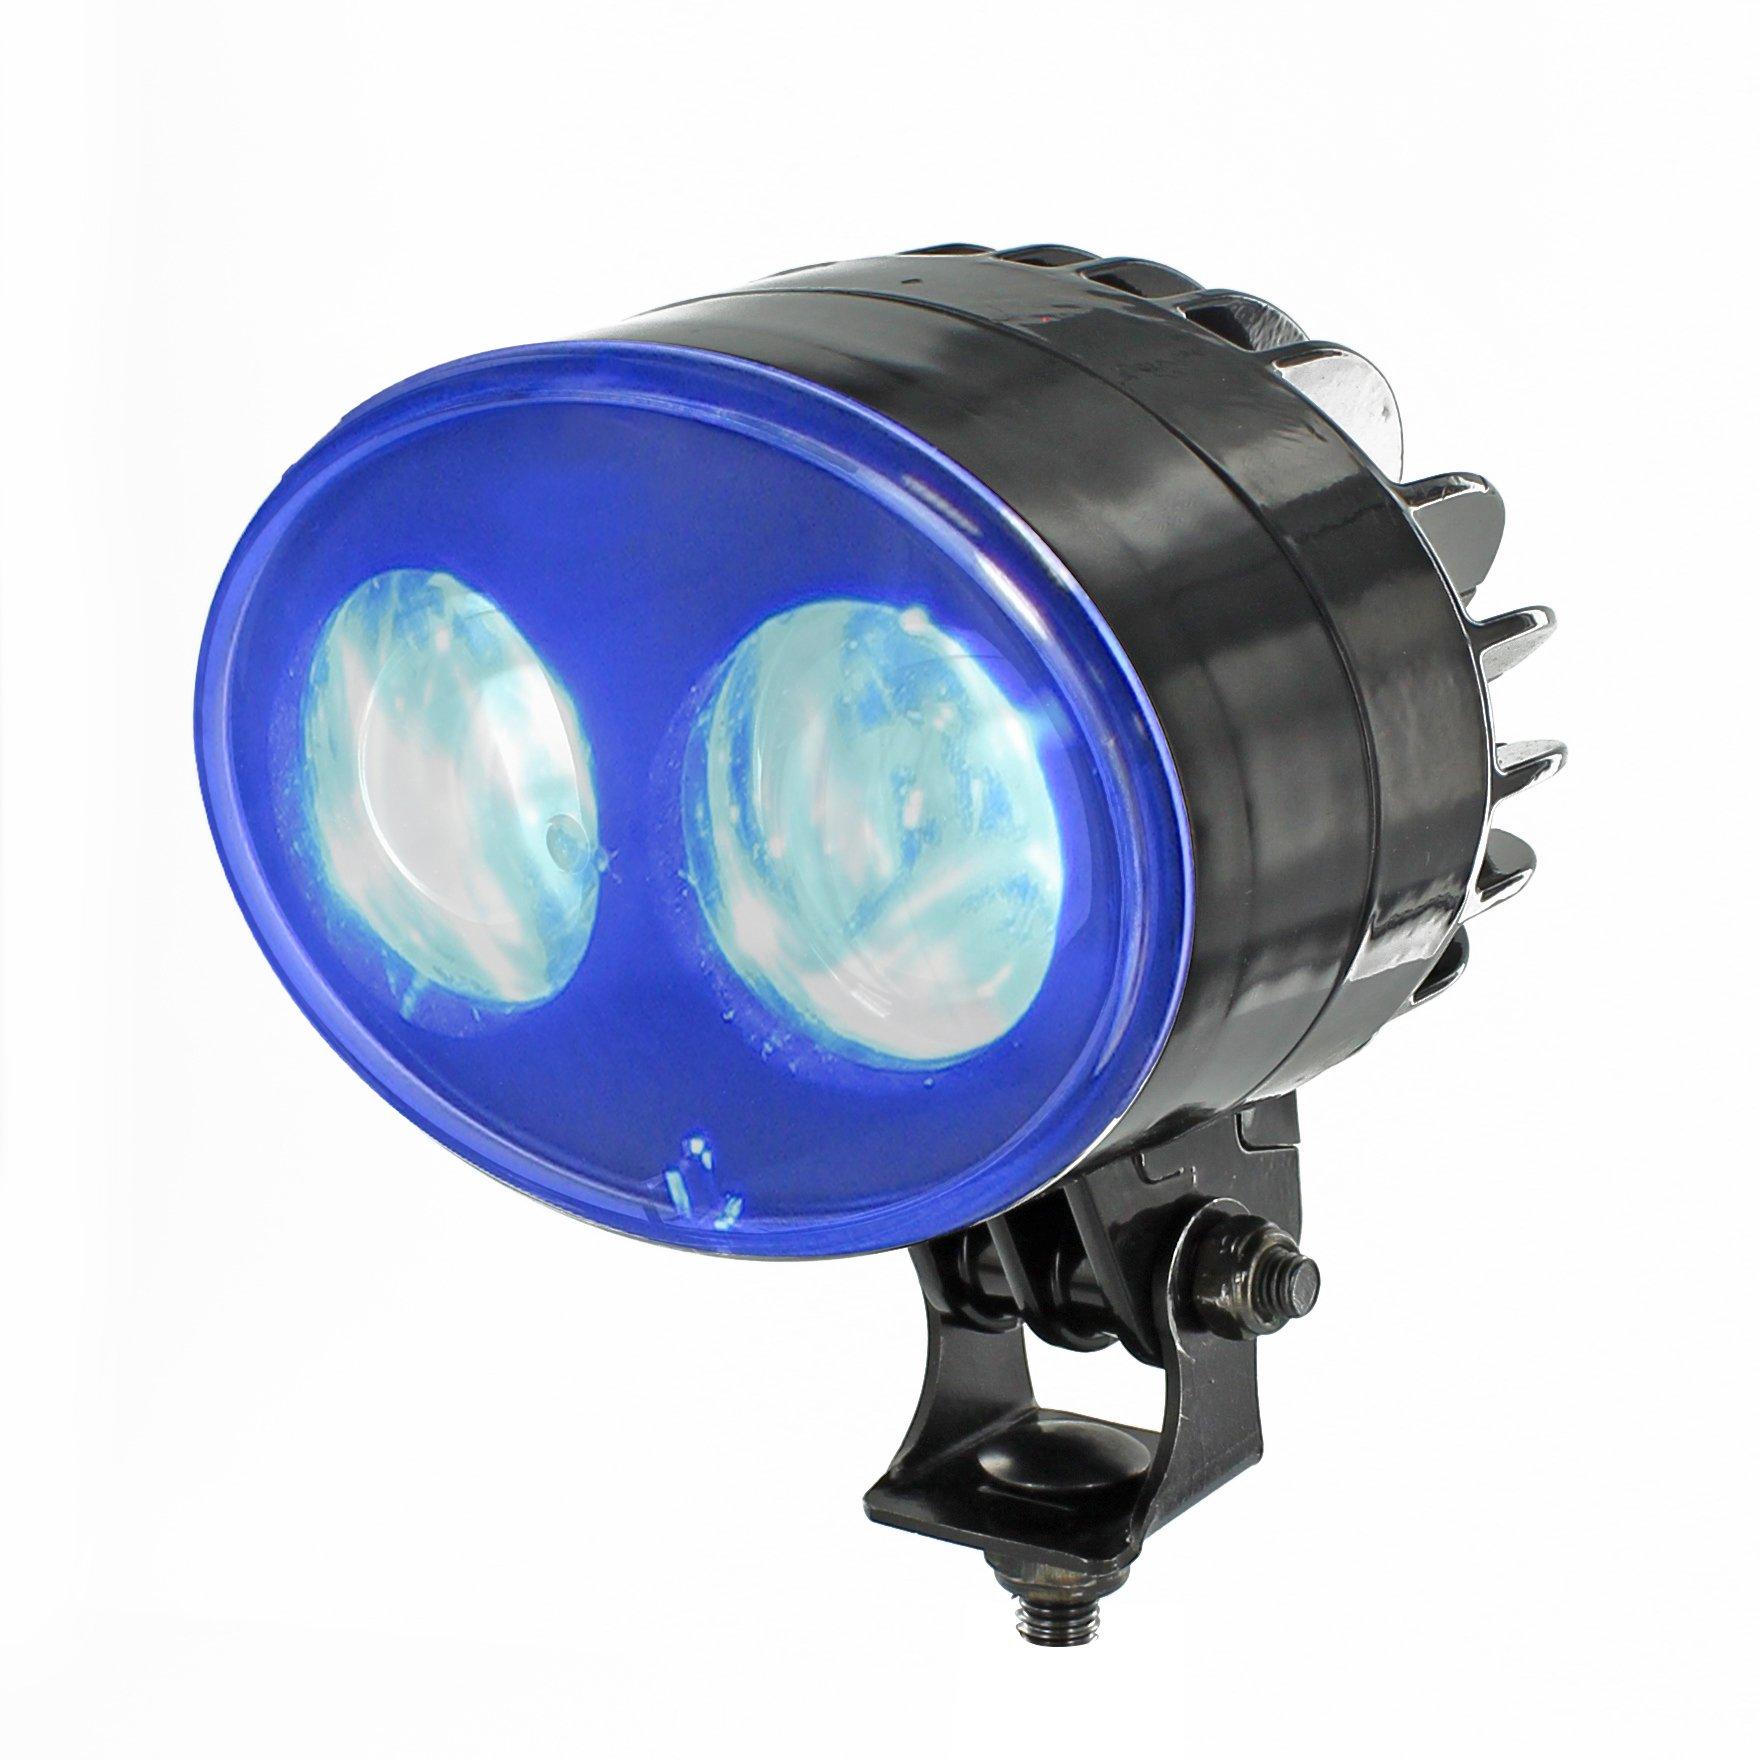 AZ SAFETY BS2 Blue Forklift Safety Light, 12-48V LED, 6'' Length, 4'' Height, 4'' Width, 9W